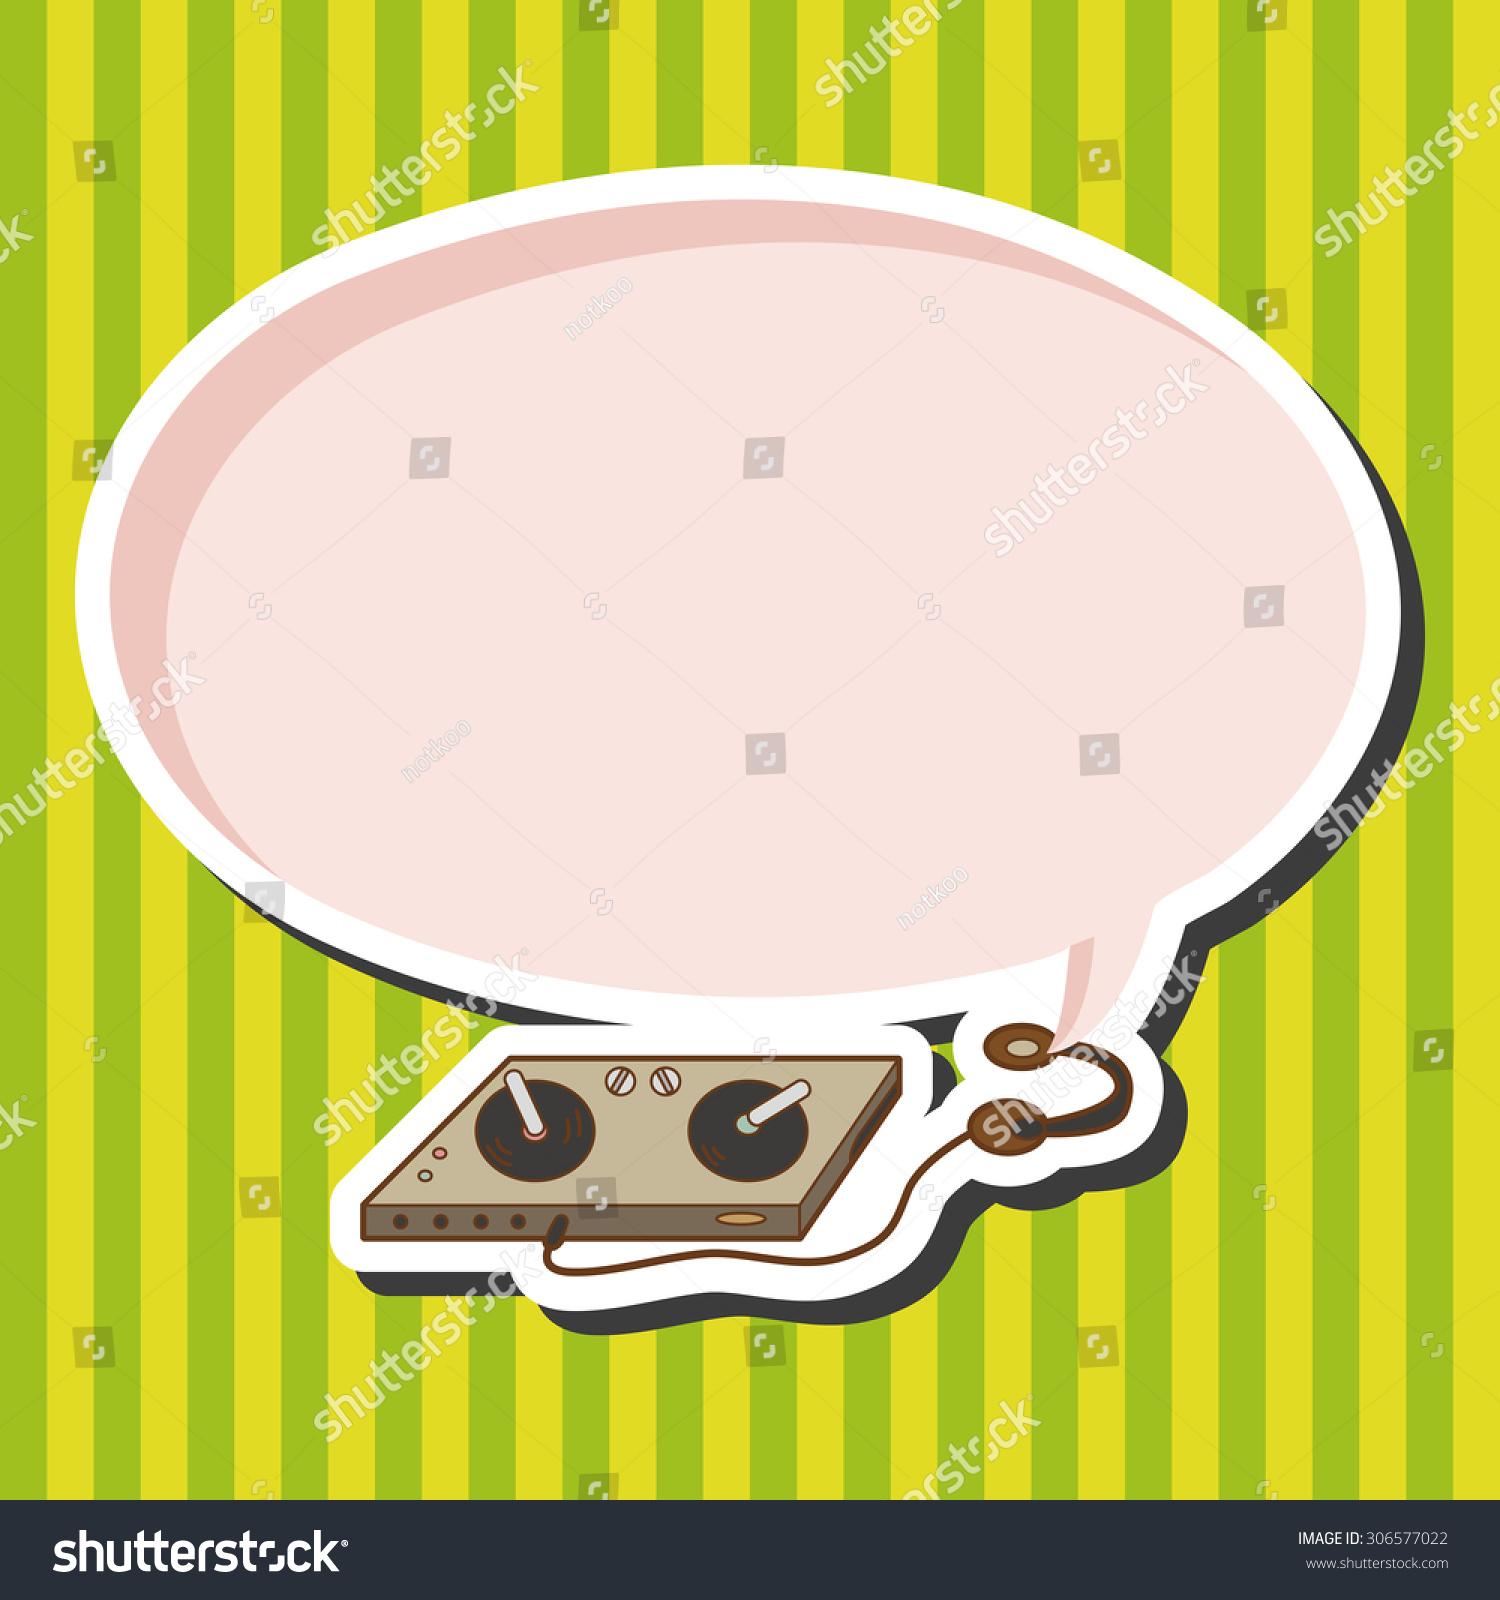 Royalty Free Stock Illustration Of Music Audio Recorder Cartoon Speech Icon